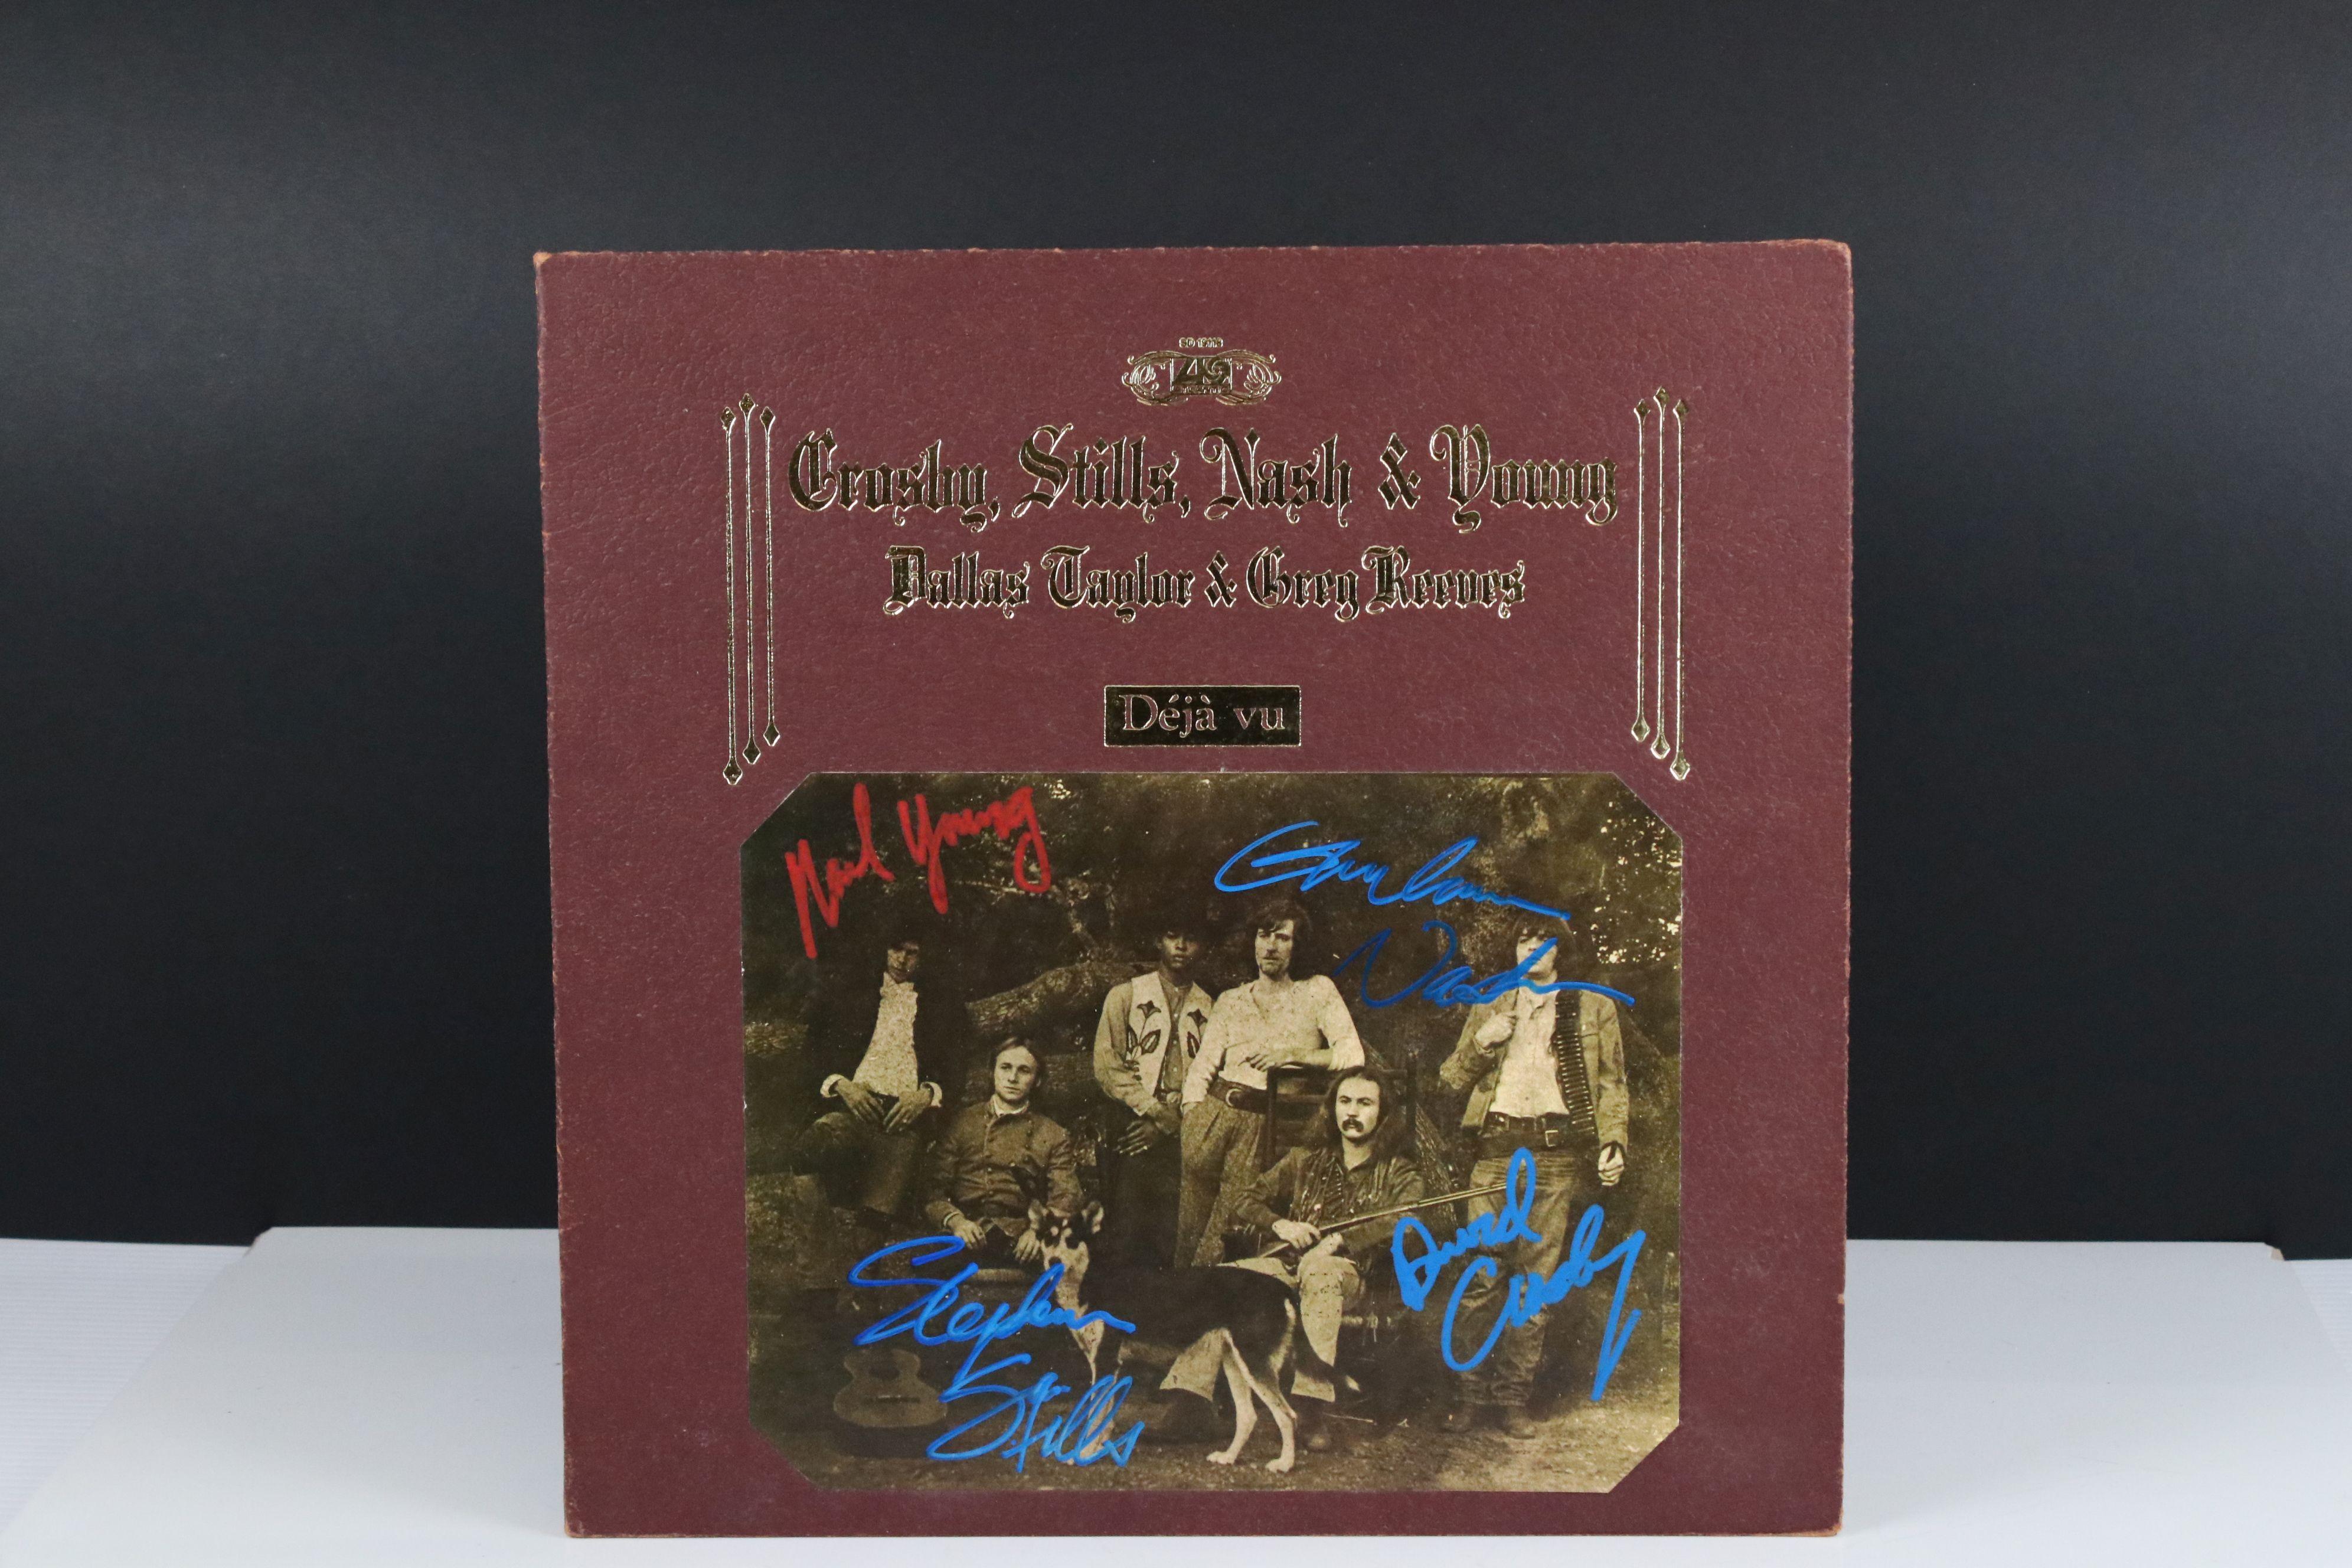 Signed Vinyl - Crosby Stills Nash & Young Deja Vu LP US pressing on Atlantic SD19118, signed by